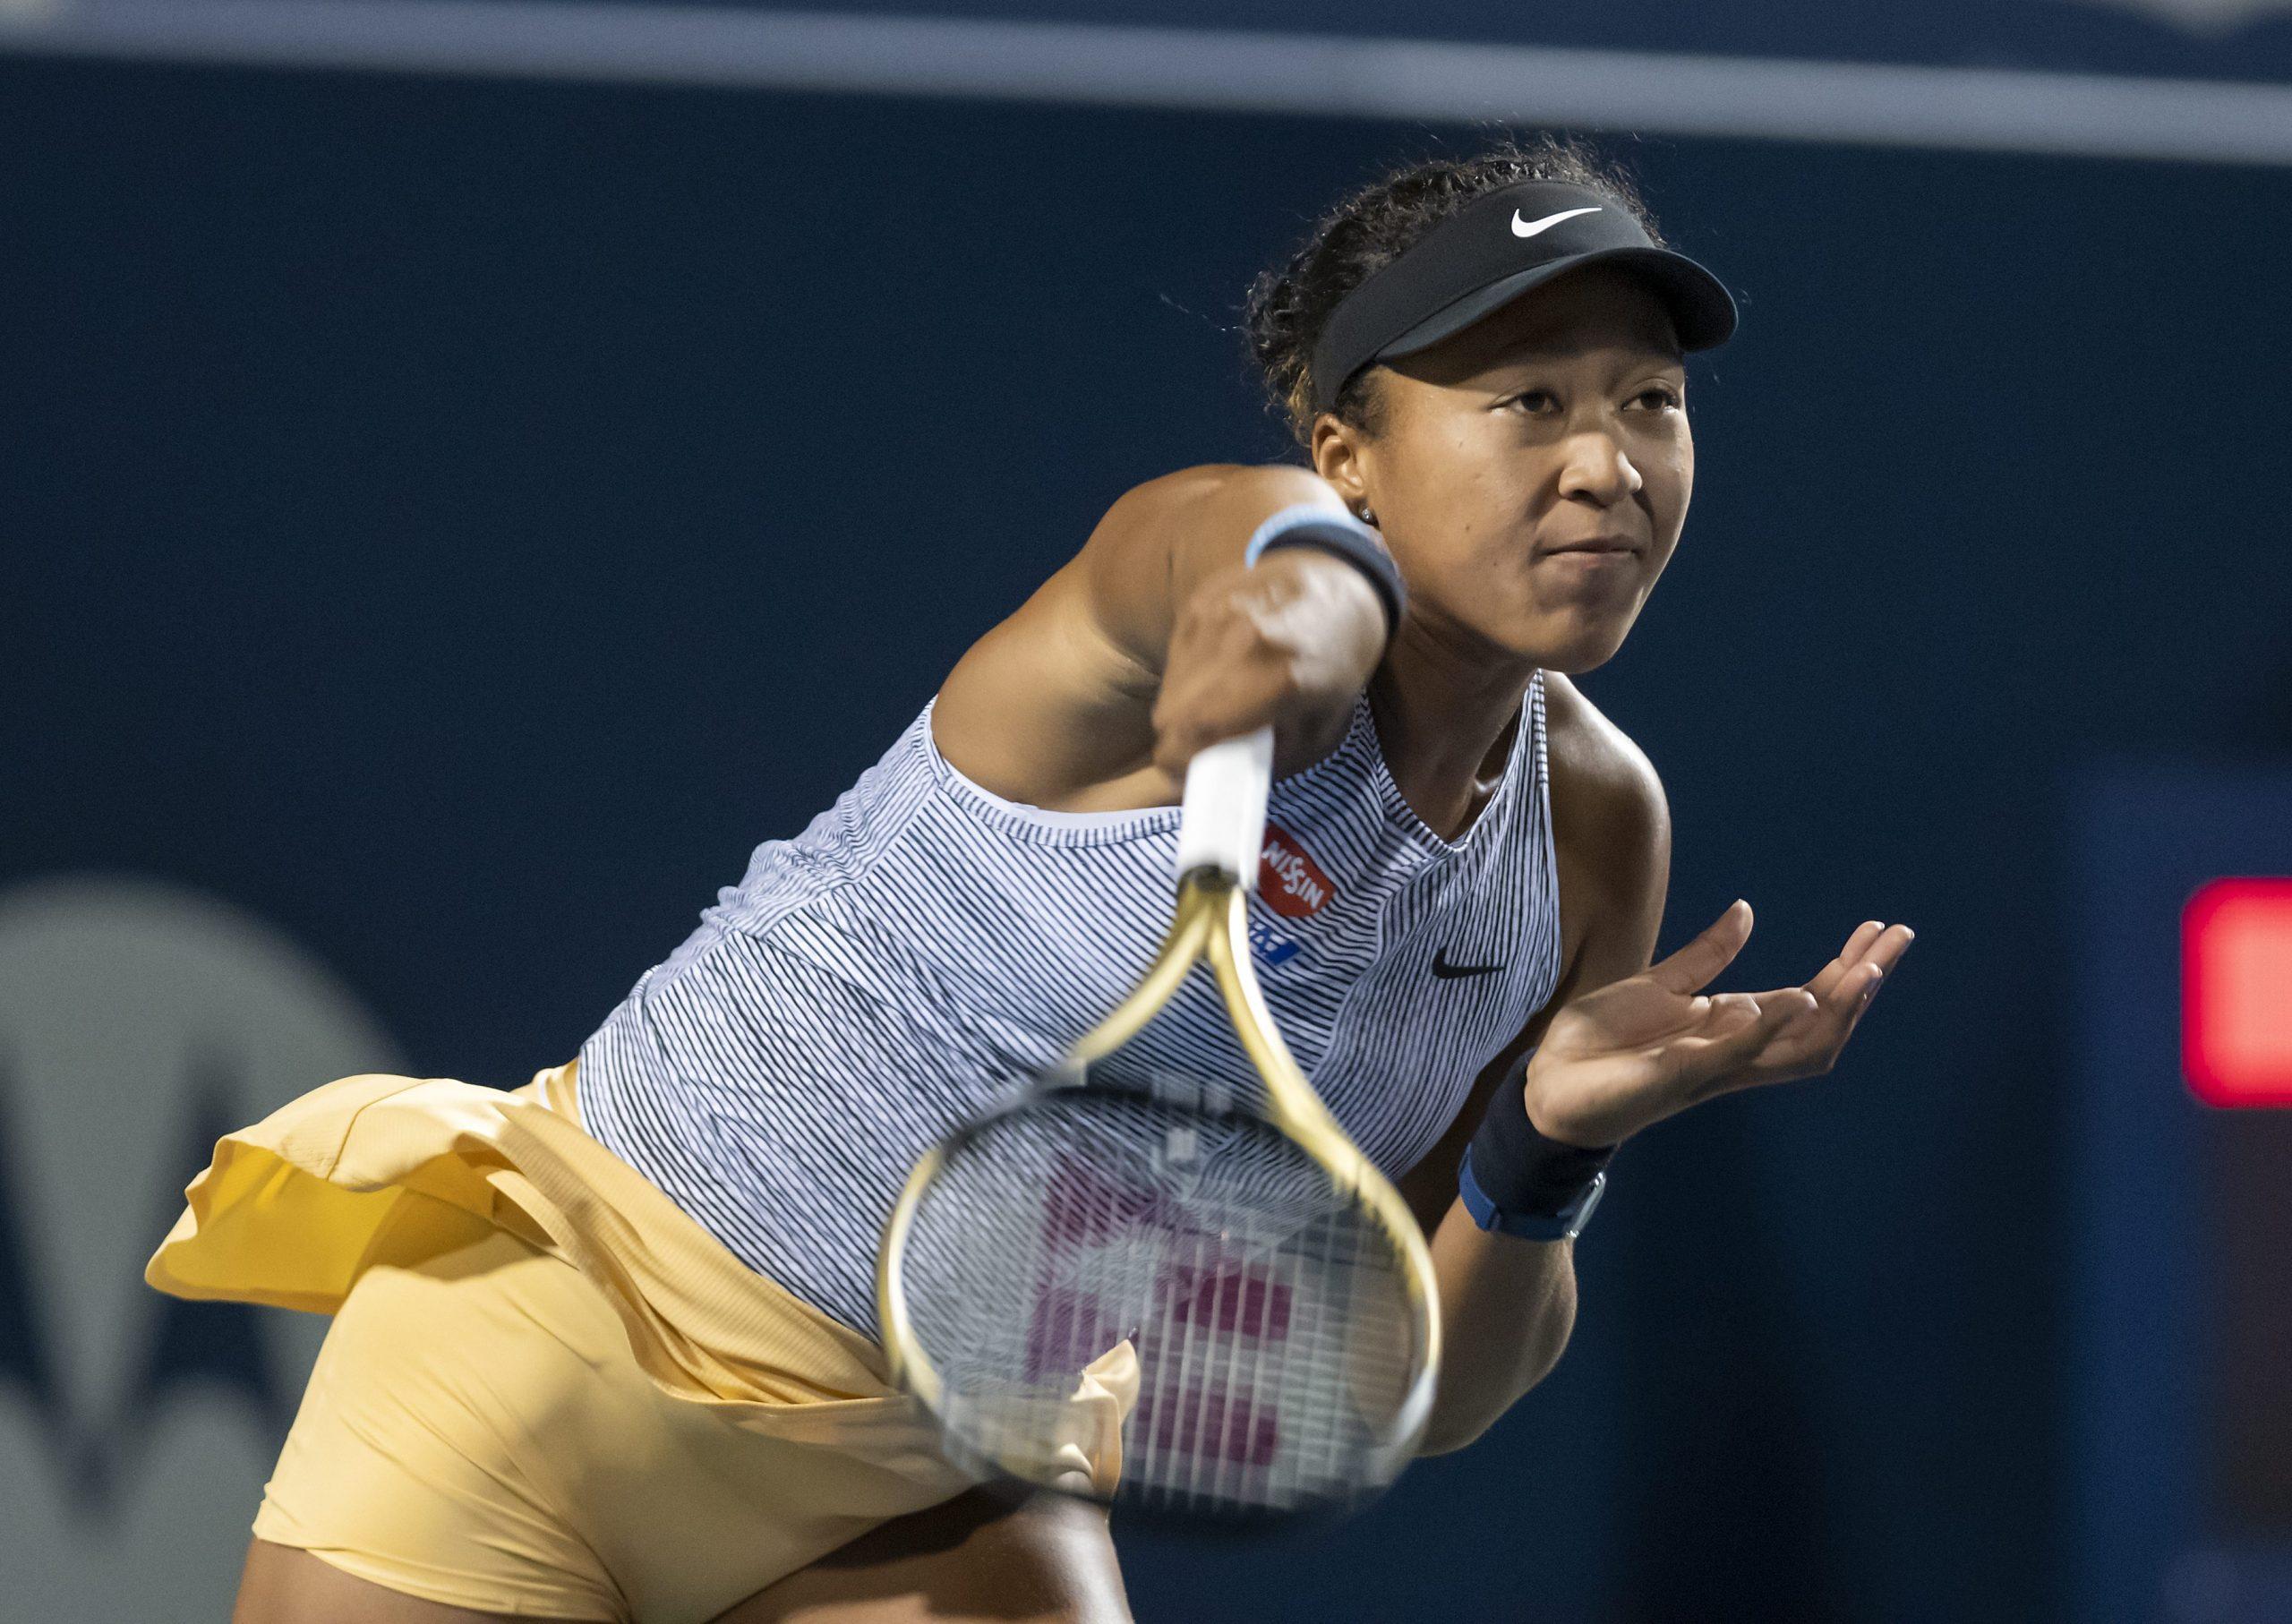 Rogers Cup women's tennis tournament in Montreal postponed until 2021